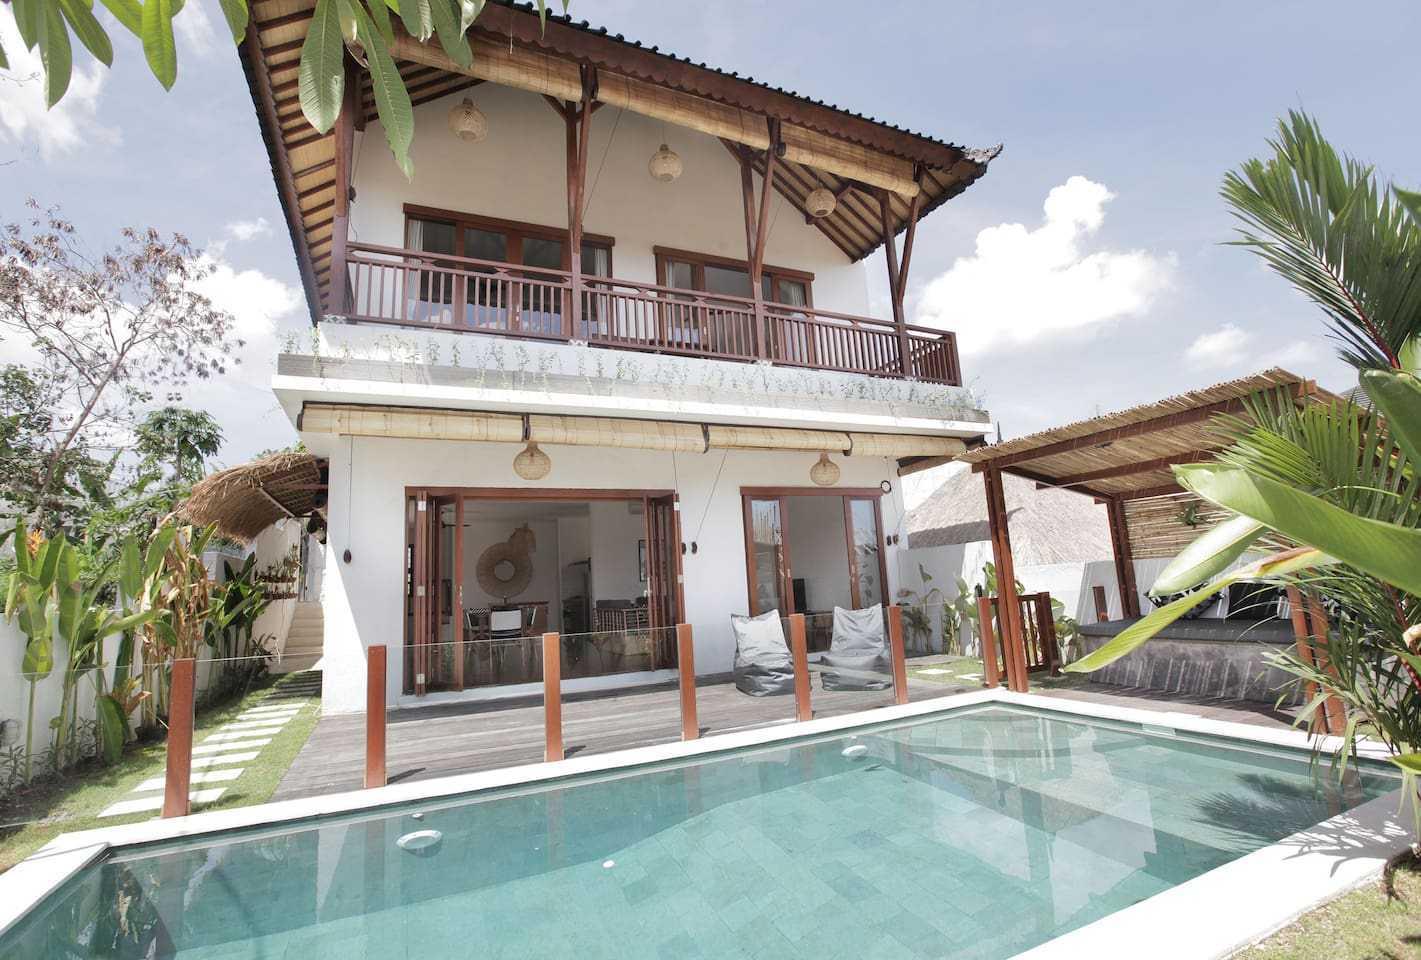 Hg Architects & Designers Associates Villa Pererenan Pererenan, Mengwi, Kabupaten Badung, Bali, Indonesia Pererenan, Mengwi, Kabupaten Badung, Bali, Indonesia Swimming Pool View Scandinavian  48586